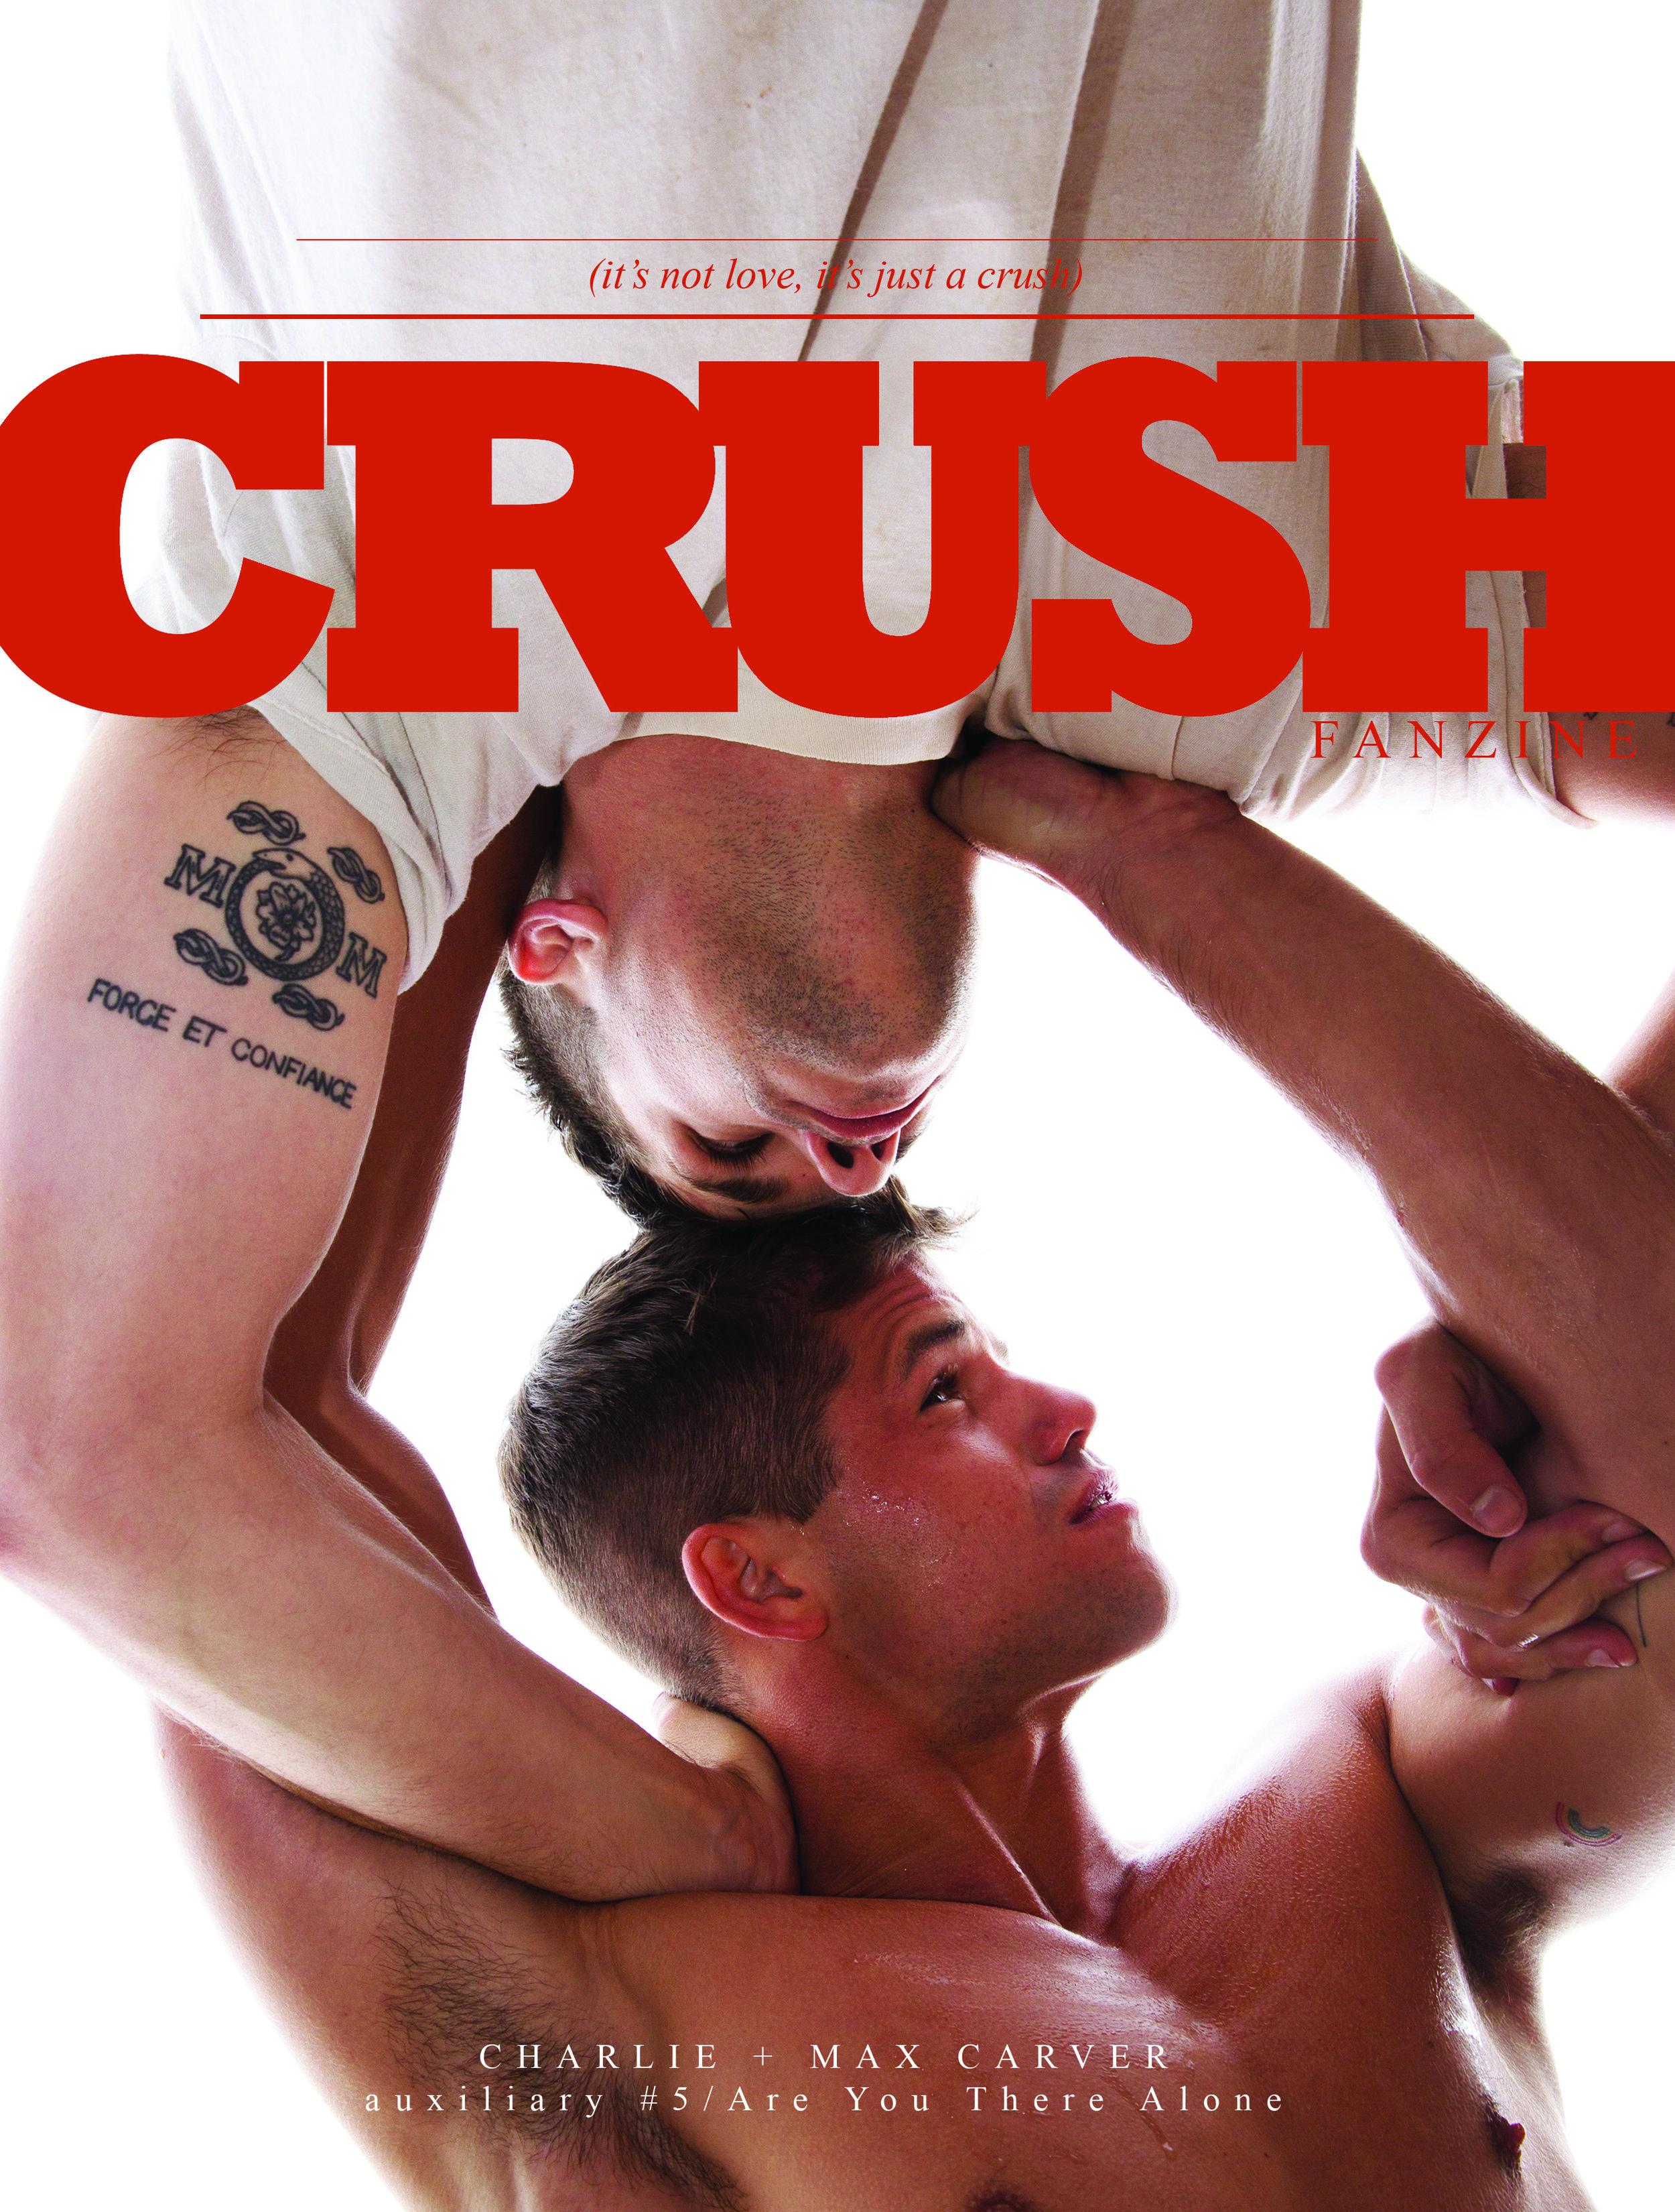 CRUSH AUX#5 TWINS Alone.jpg